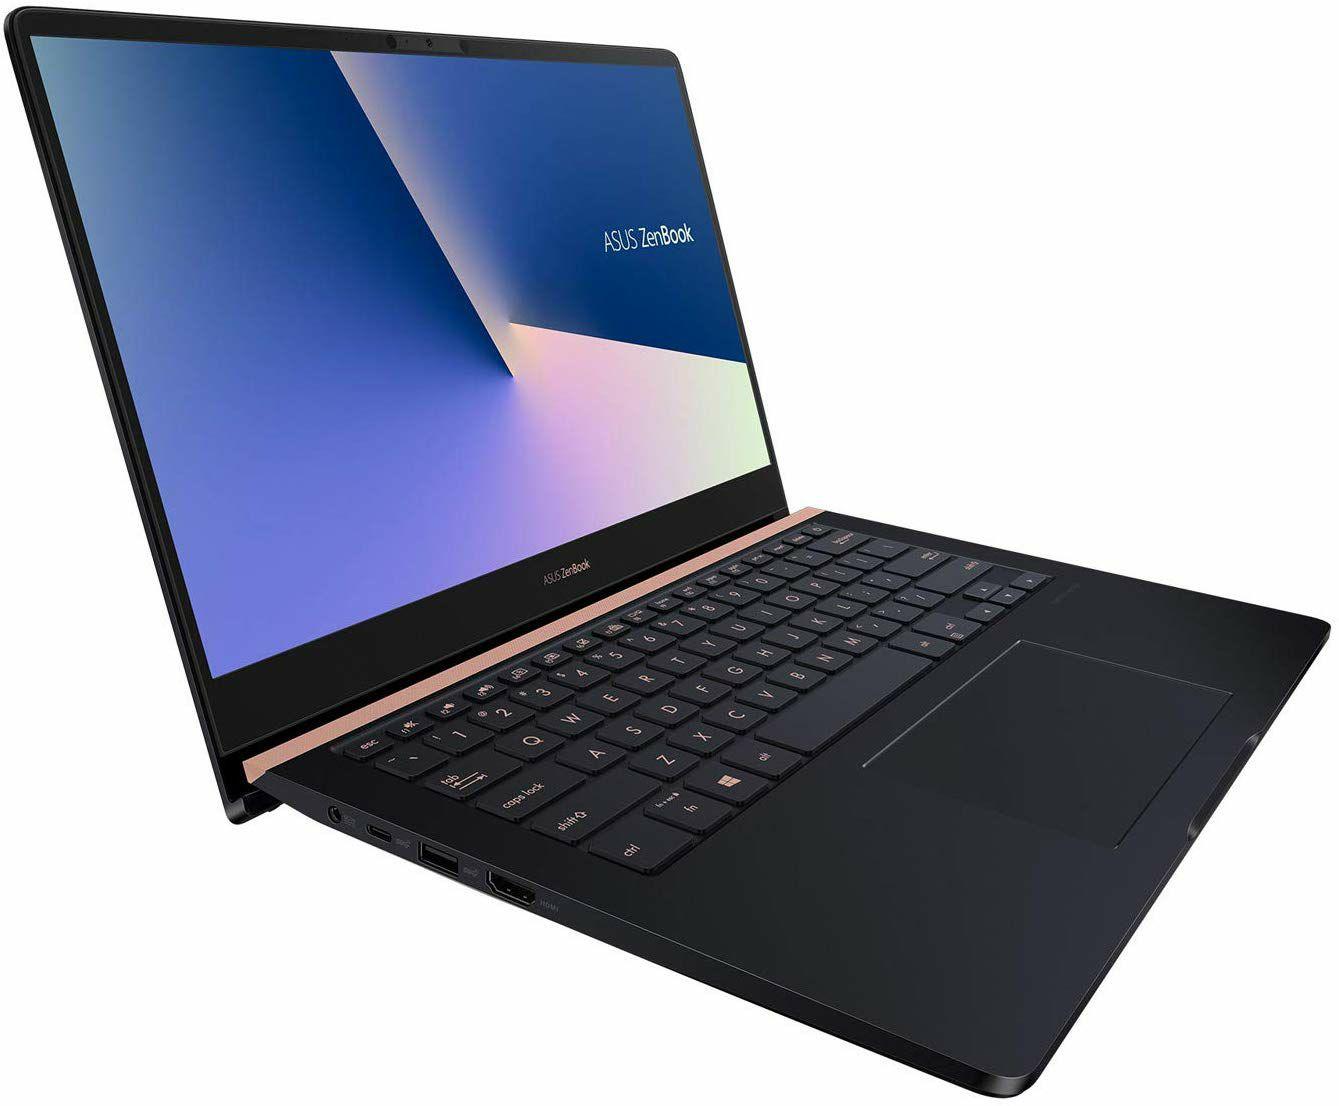 "Asus Zenbook Notebook 14"" - FHD, iPS, 100% sRGB, i5-8265U, 8GB RAM, 512GB SSD PCIe, GTX 1050, 70Wh, 1.6kg, AZERTY Tastatur (Cdiscount)"